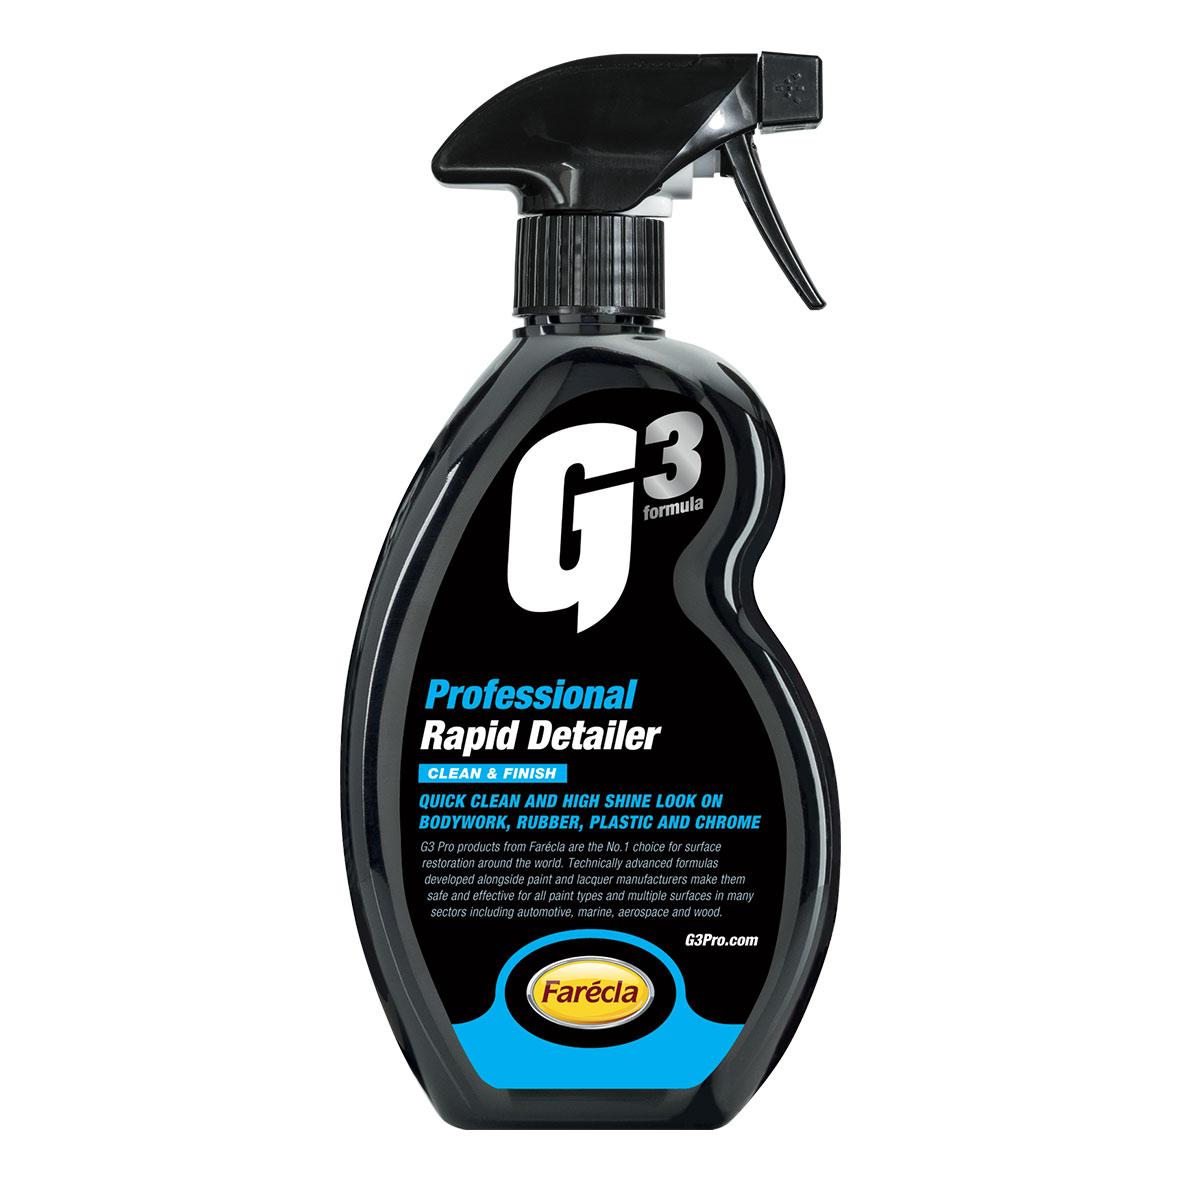 G3 Professional Rapid Detailer